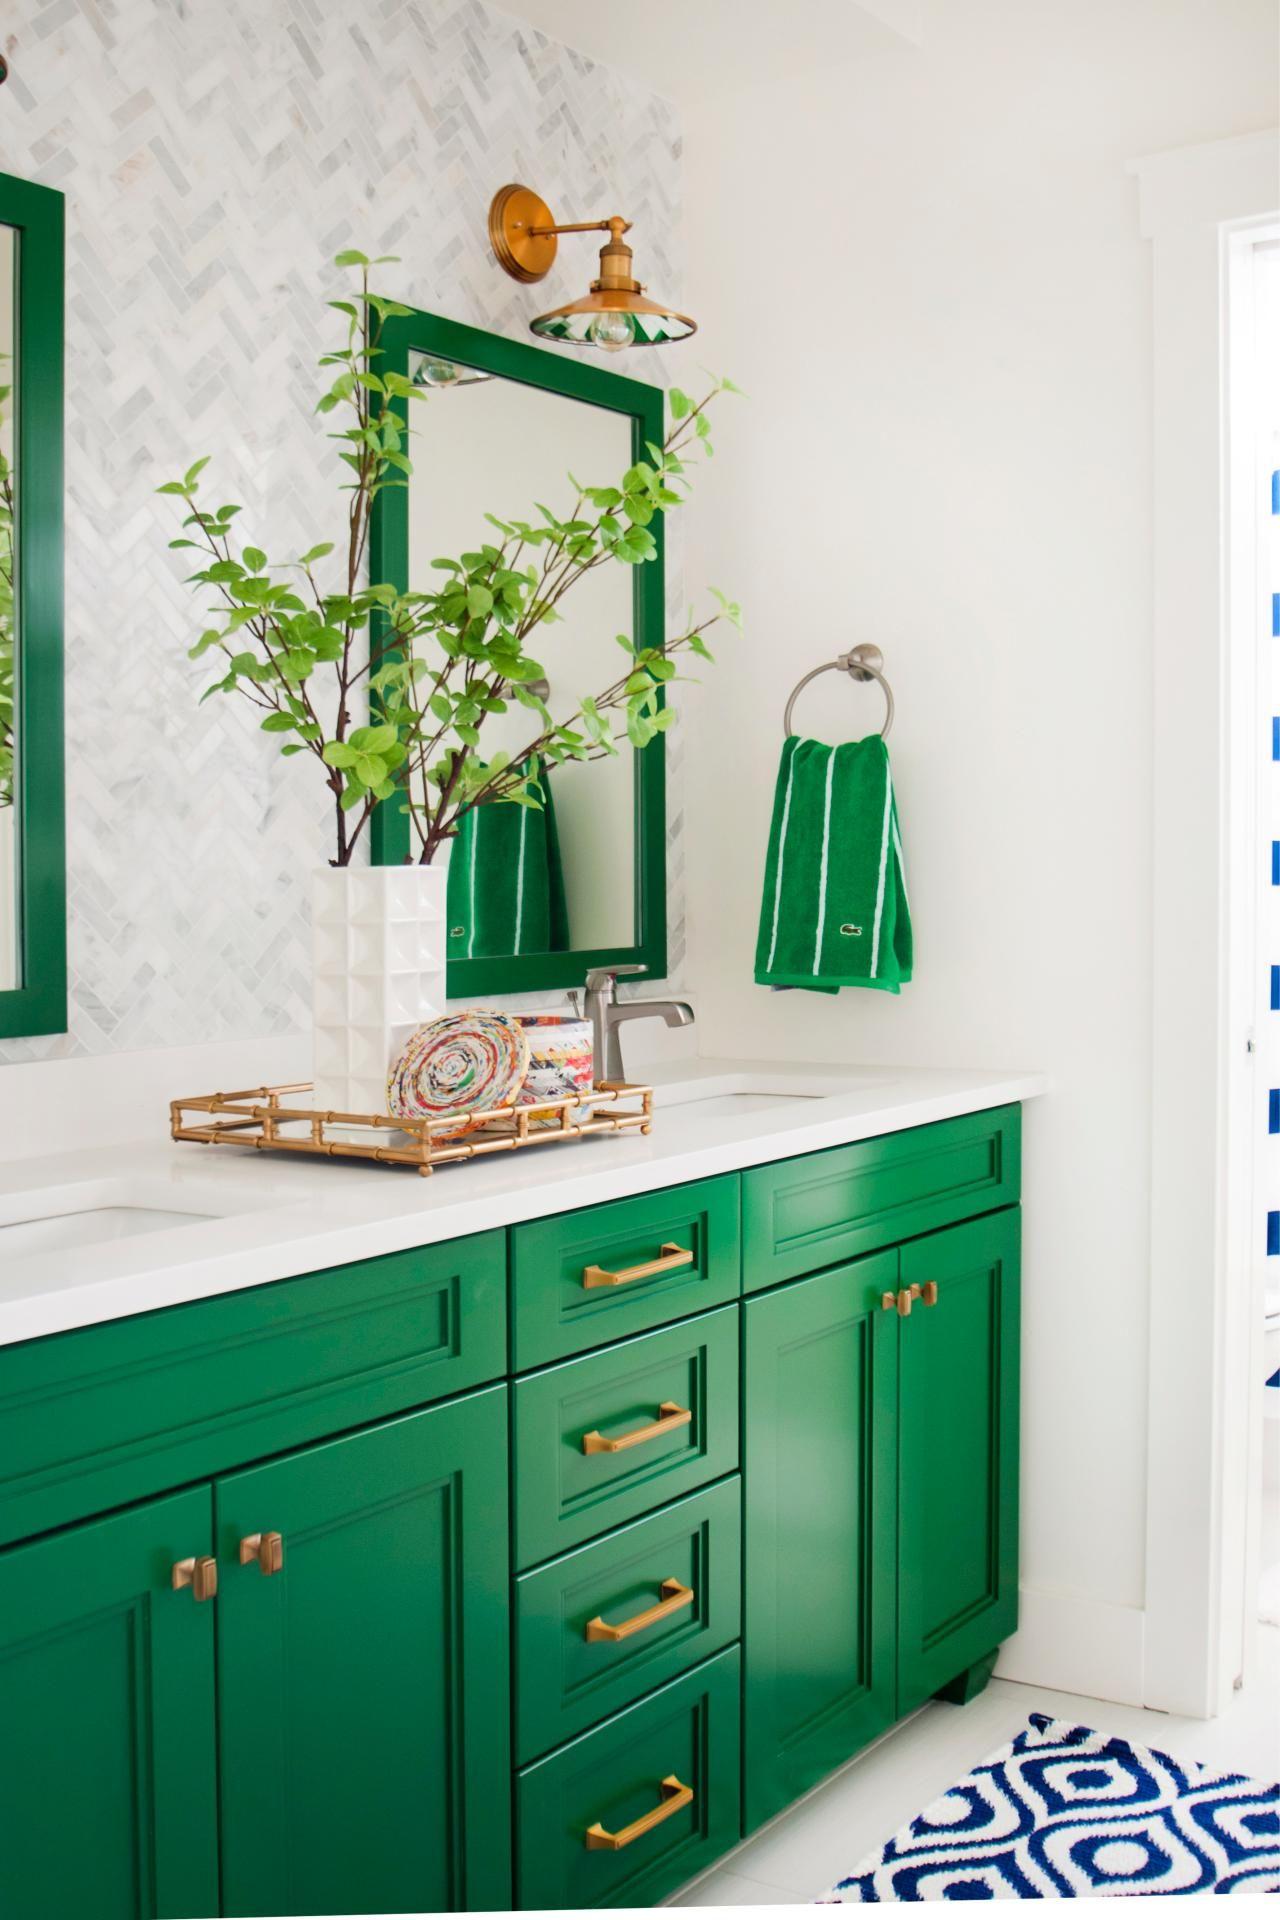 Colorful Home Remodel Creates a Study in Contrasts   Bagno, Colore e ...